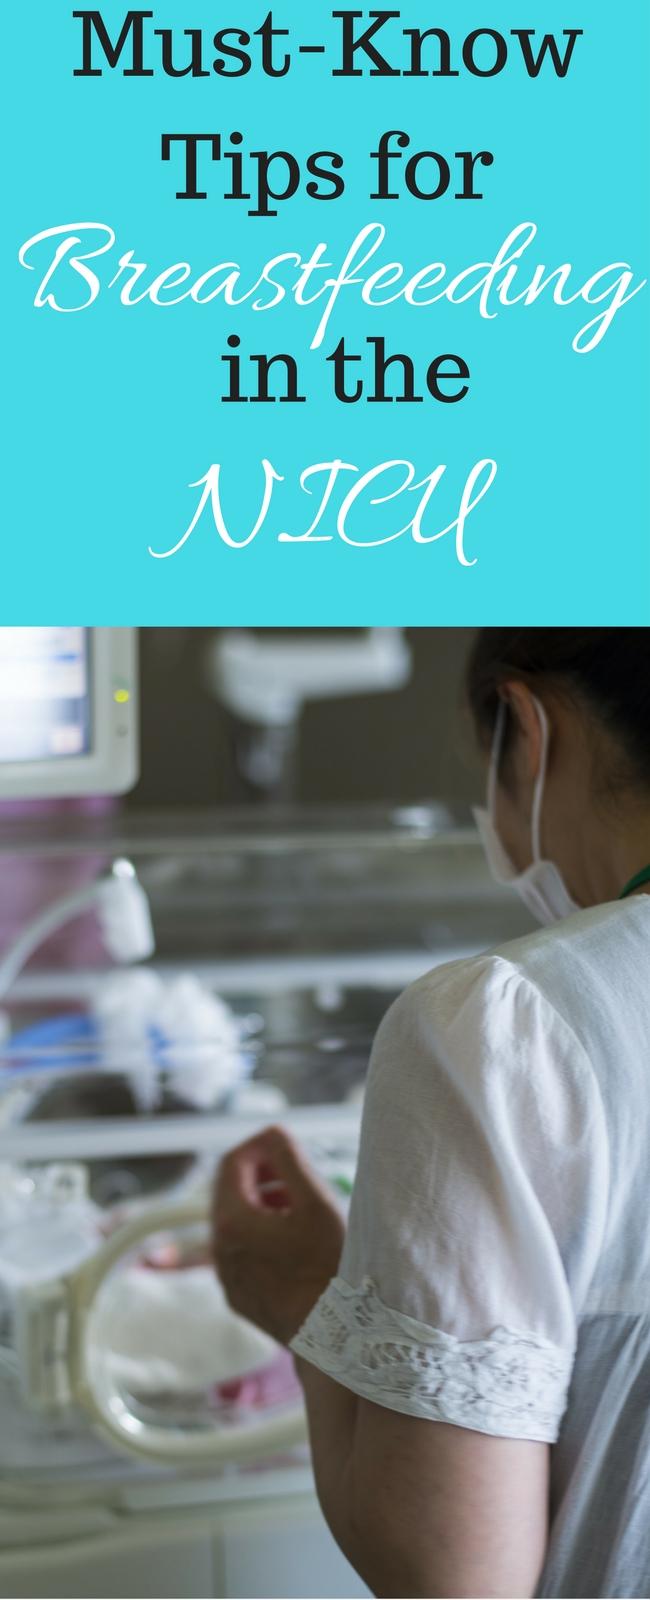 Breastfeeding in the NICU: What I Wish I'd Known - The Breastfeeding Mama